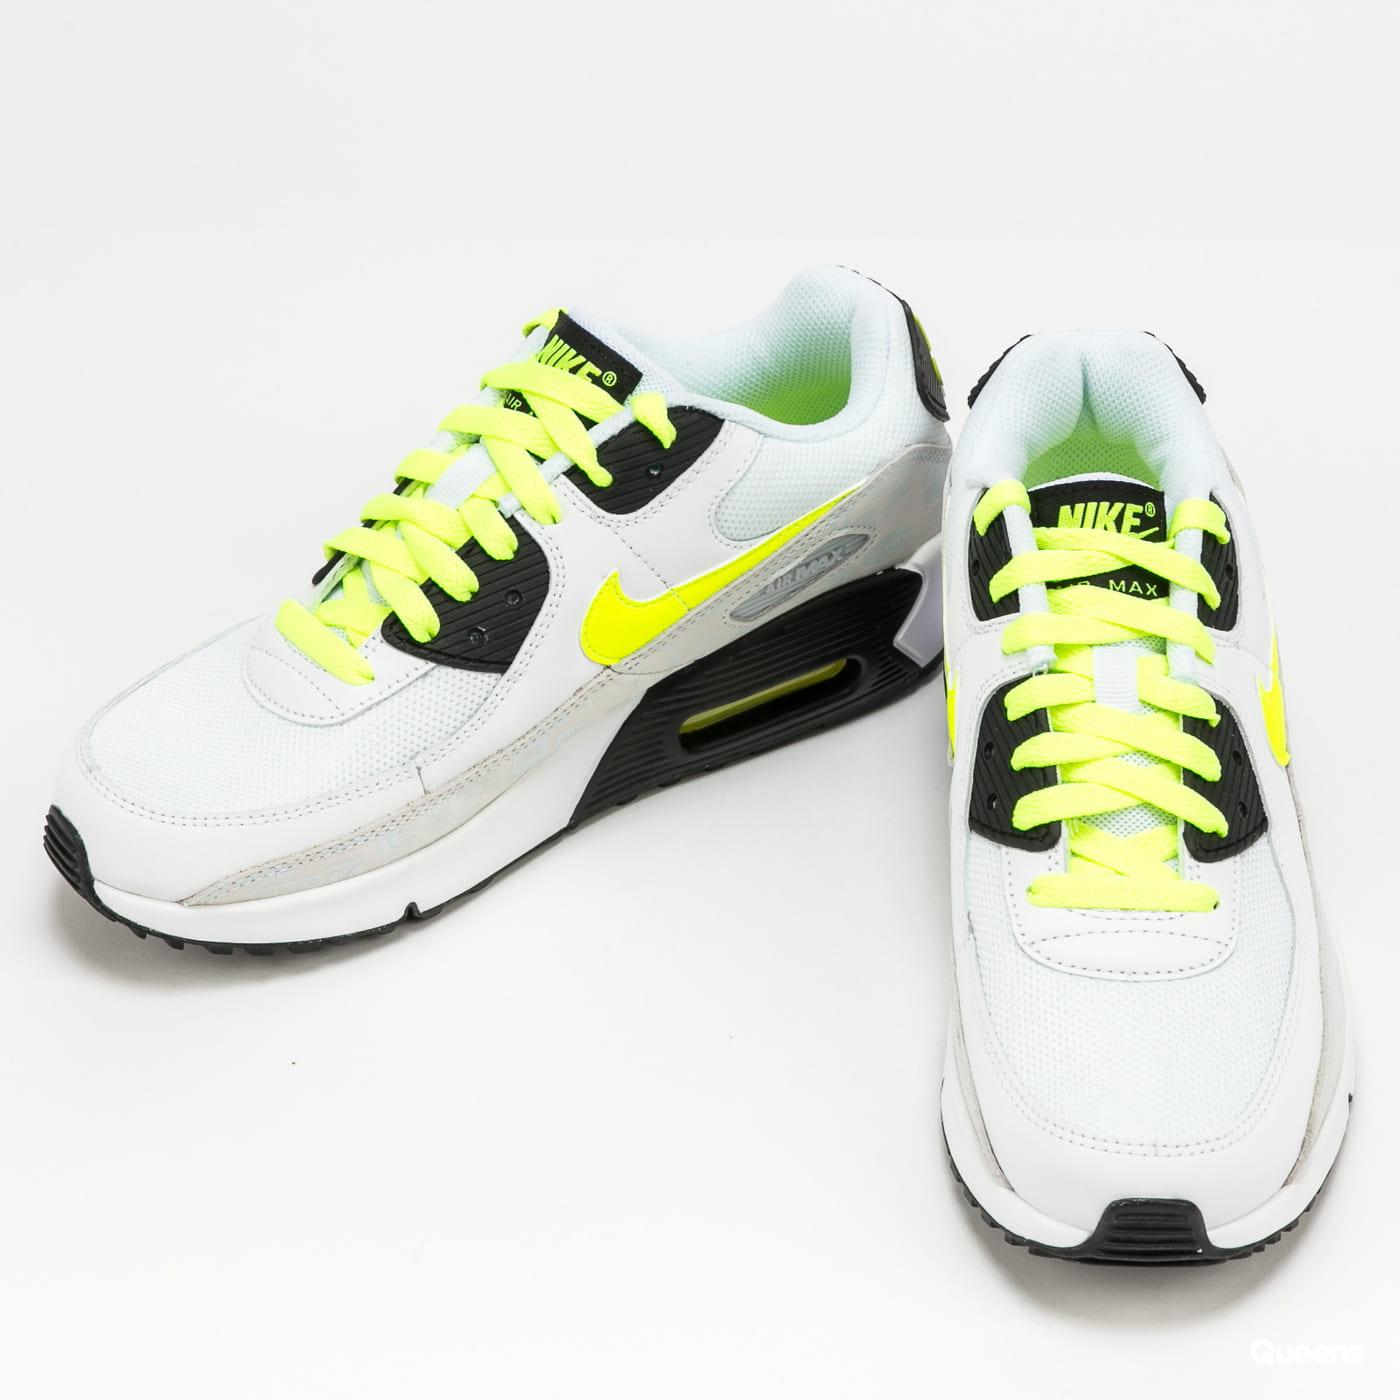 Nike Air Max 90 Leather (GS) white / volt - black - pure platinum